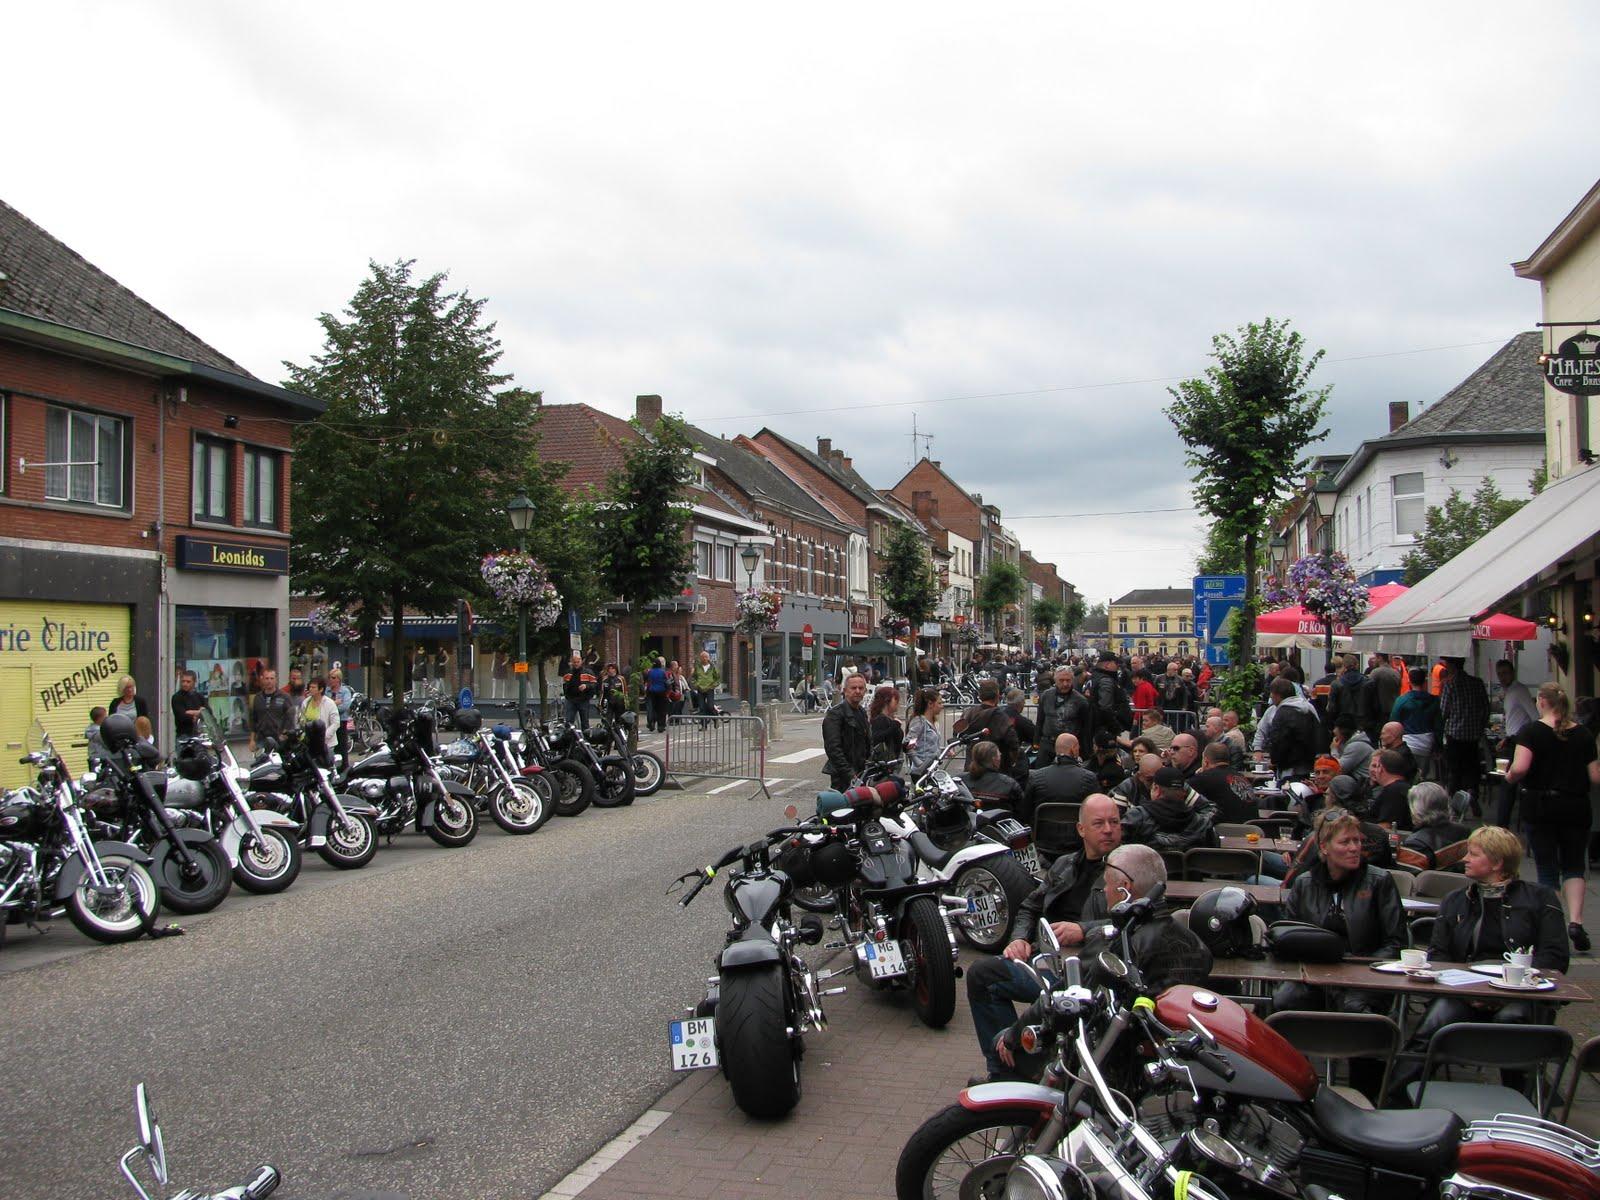 Barb S Harley Davidson Riding Academy